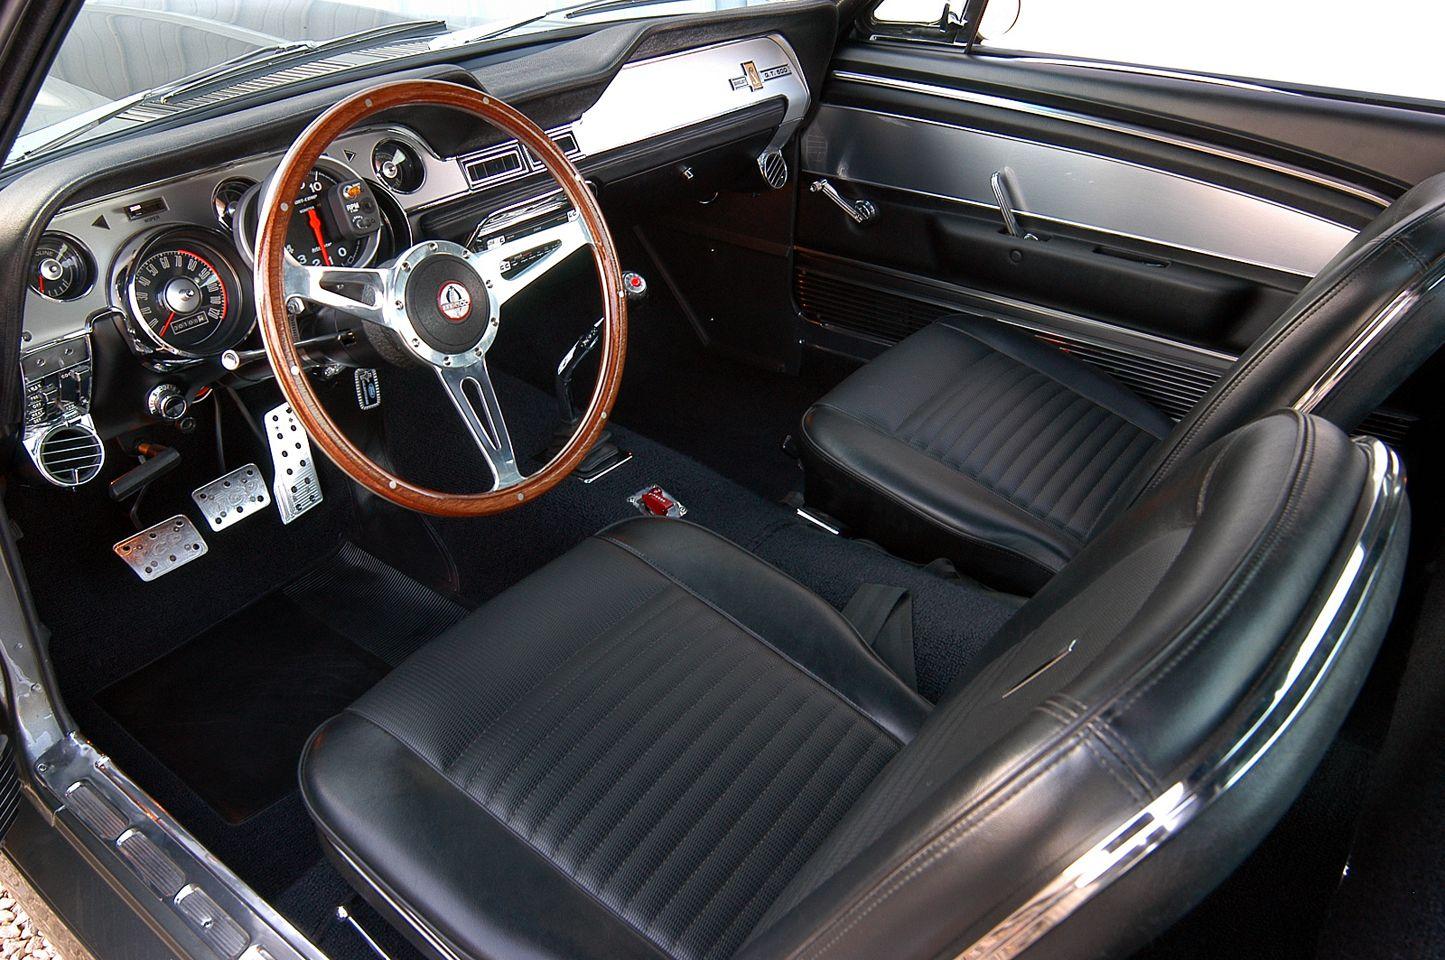 1967 Shelby Mustang Interior Mustang Interior 1967 Mustang